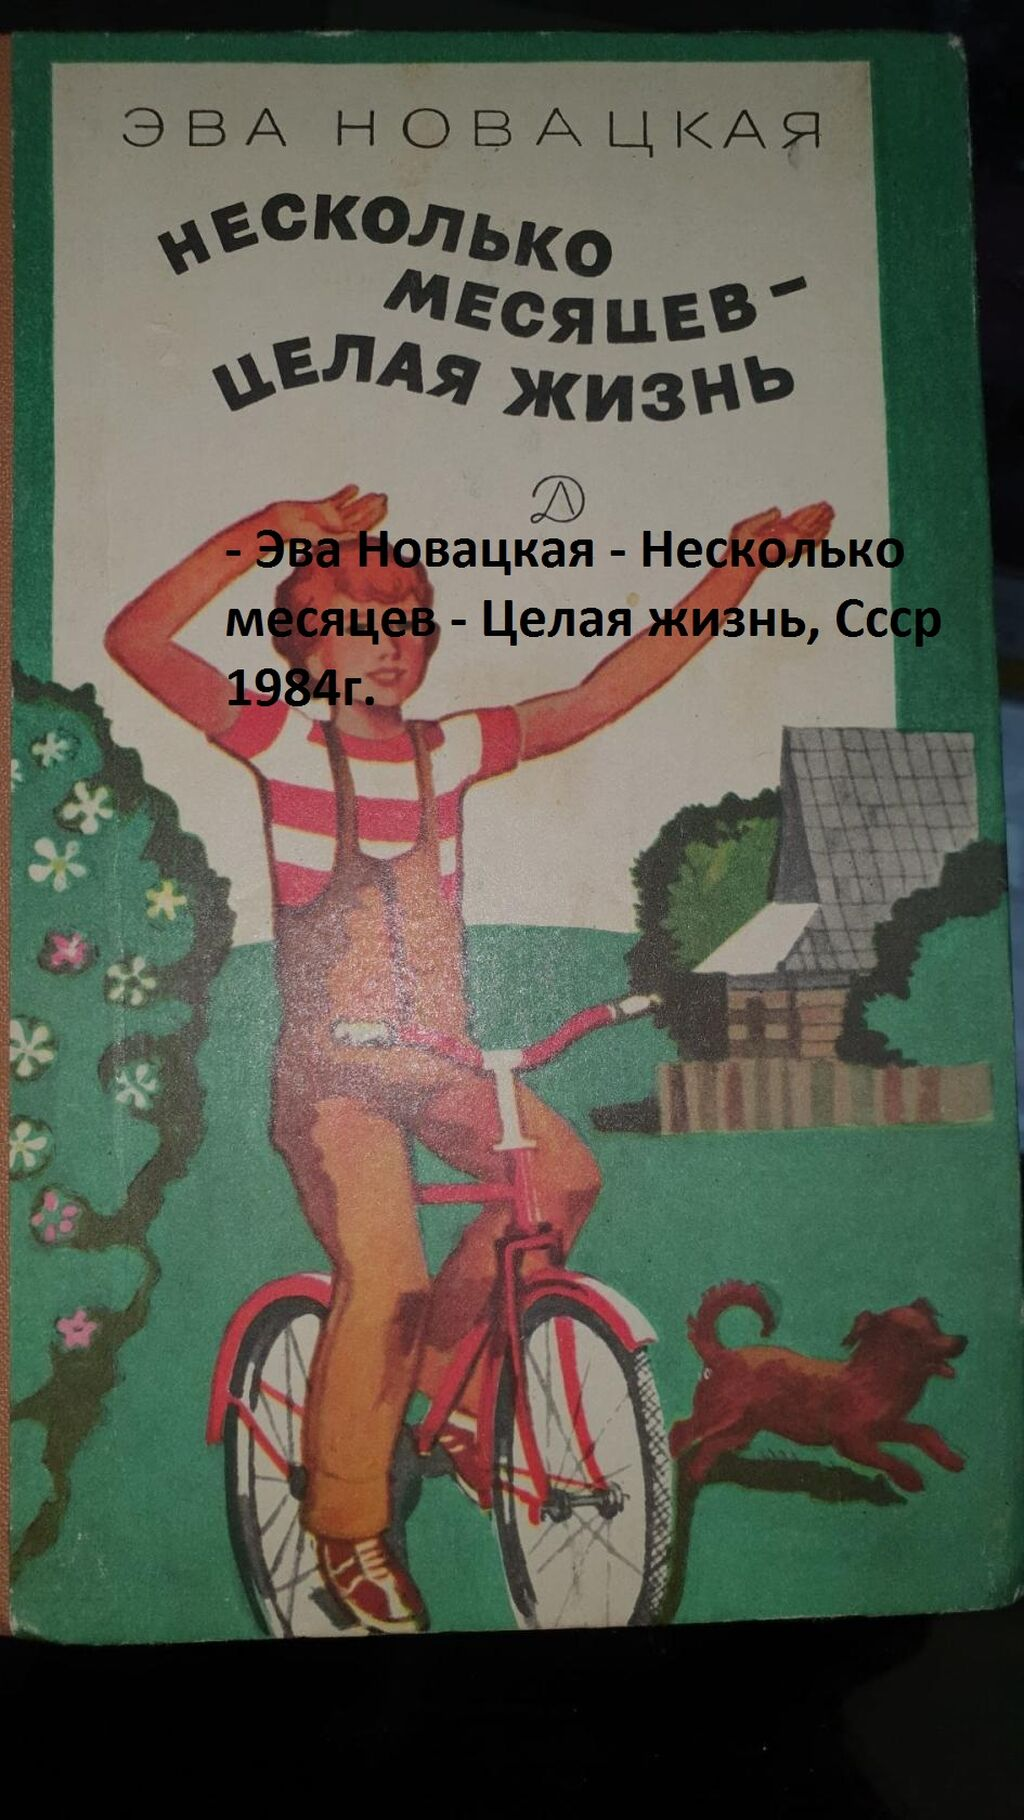 - Эва Новацкая - Несколько месяцев - Целая жизнь, Ссср 1984г